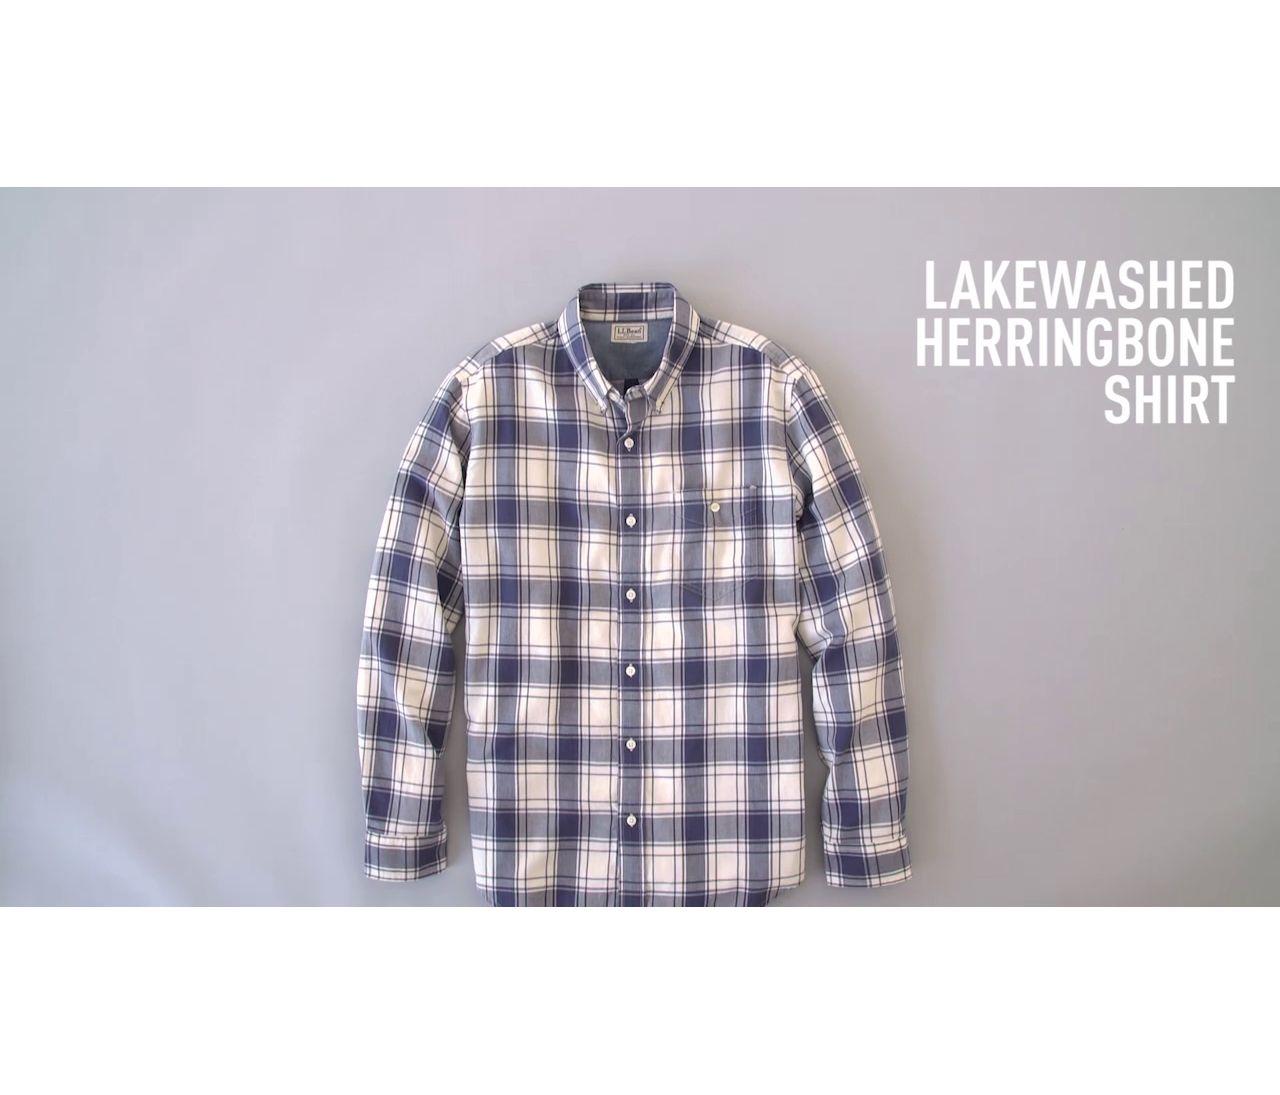 Video: Lakewashed Herringbone Shirt